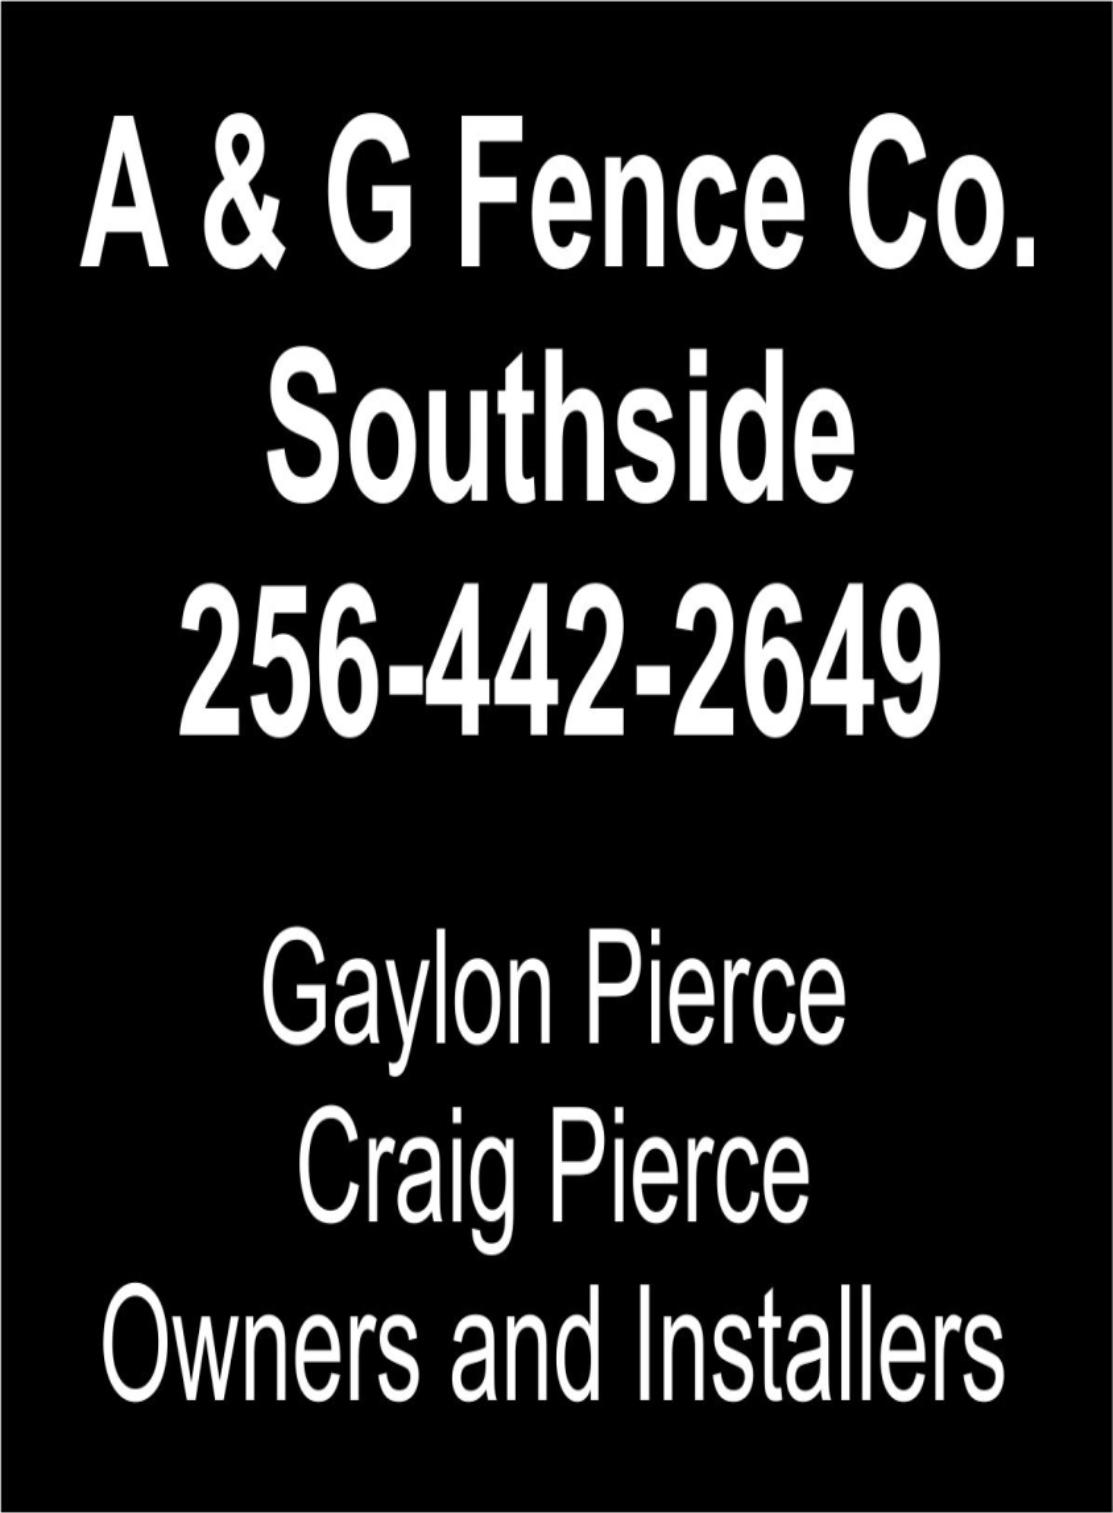 a&G fence